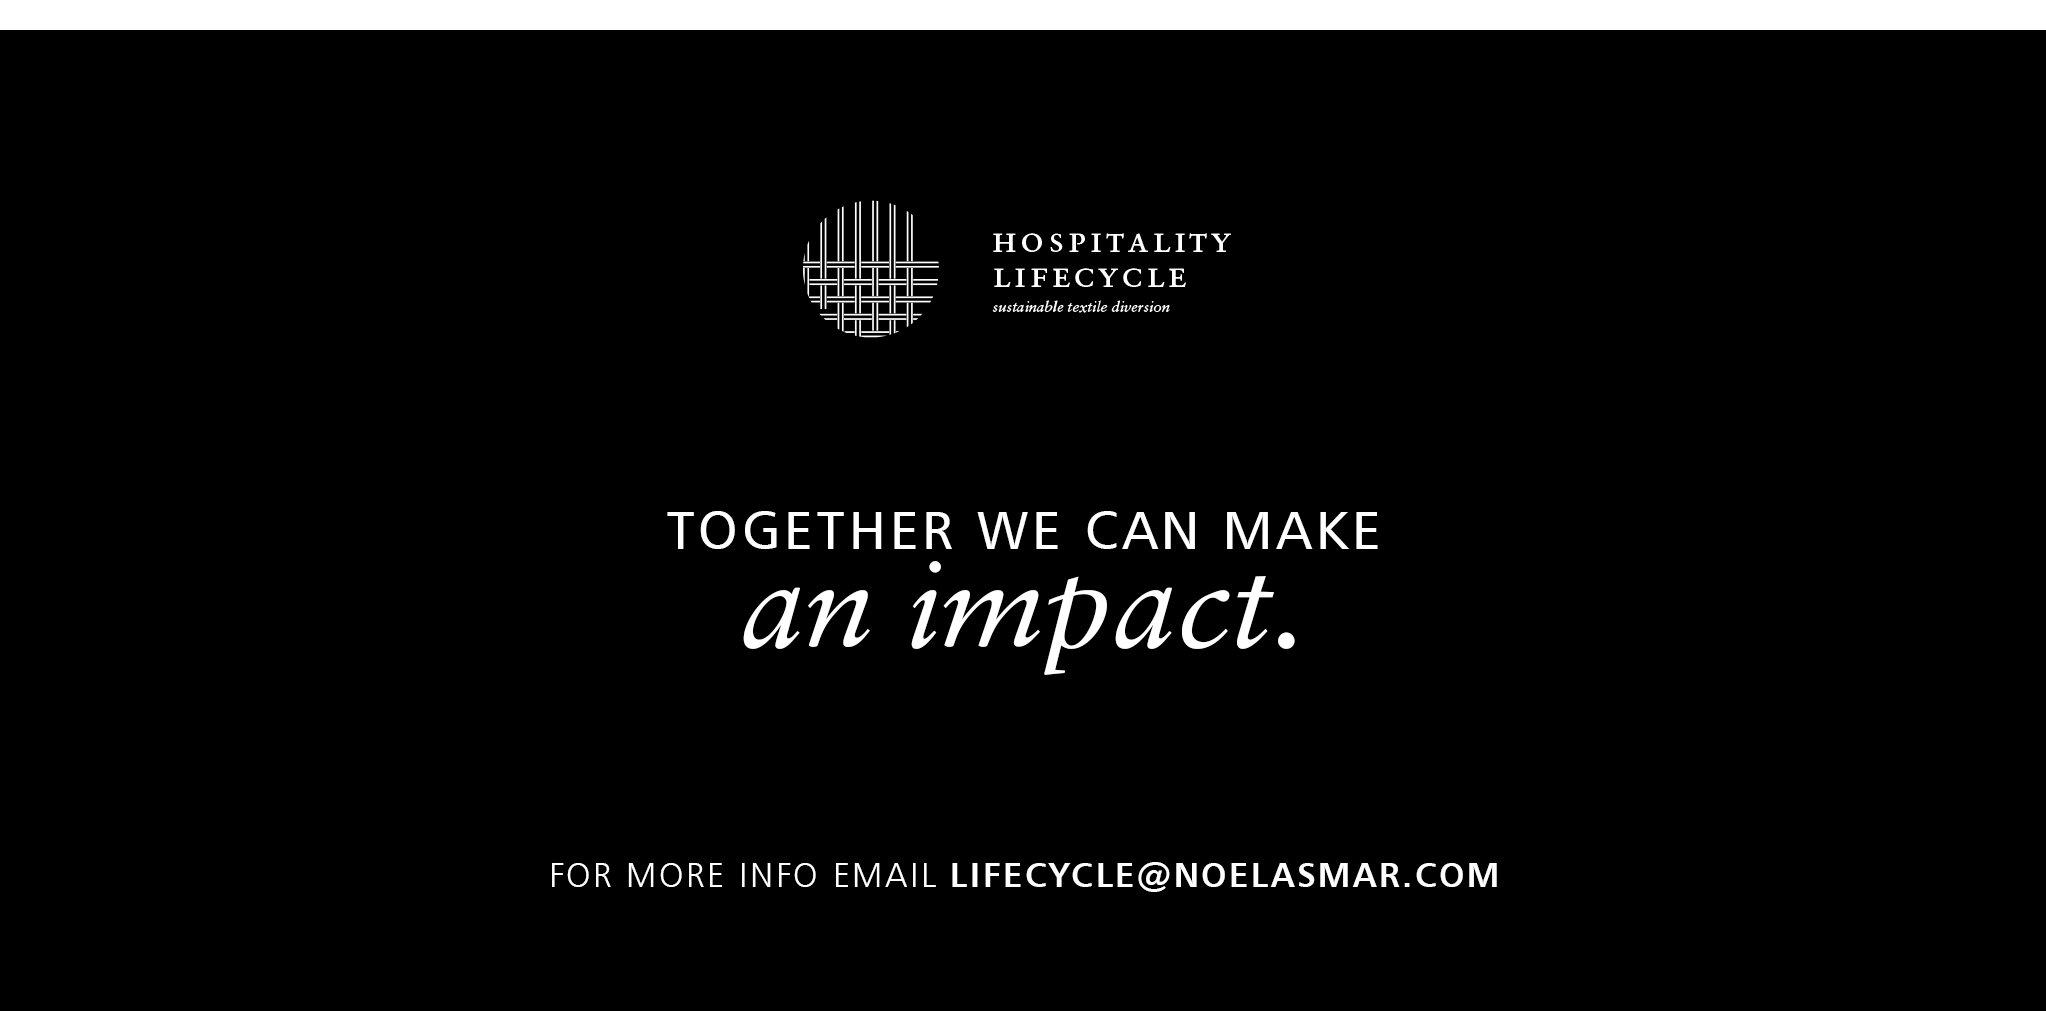 10_11_19-HospitalityLifecycle-For-Debrand_Proof_06.jpg